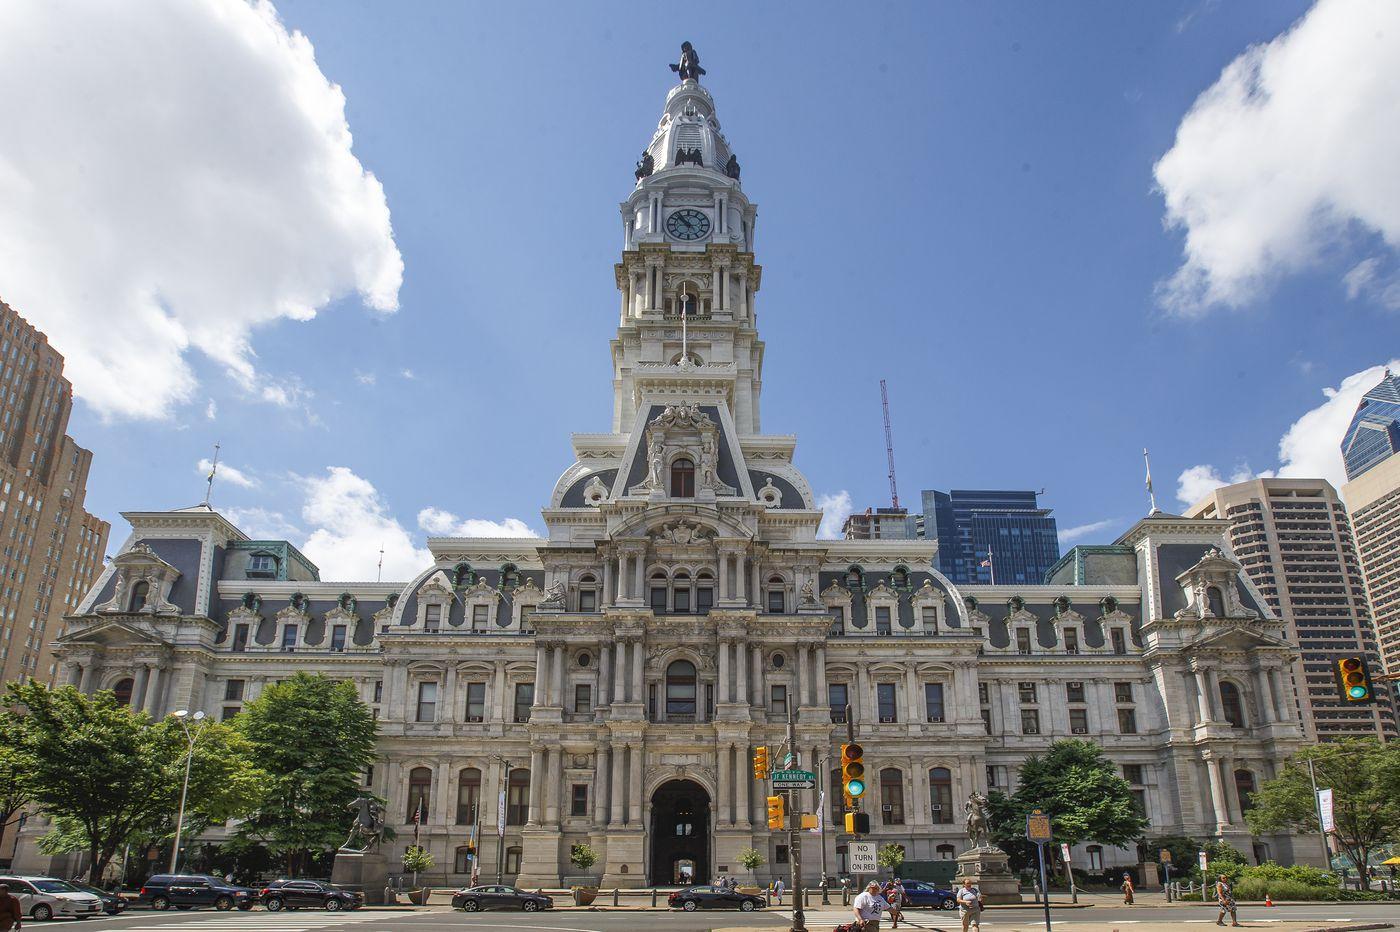 Philly has to break its bad money-handling habits | Editorial